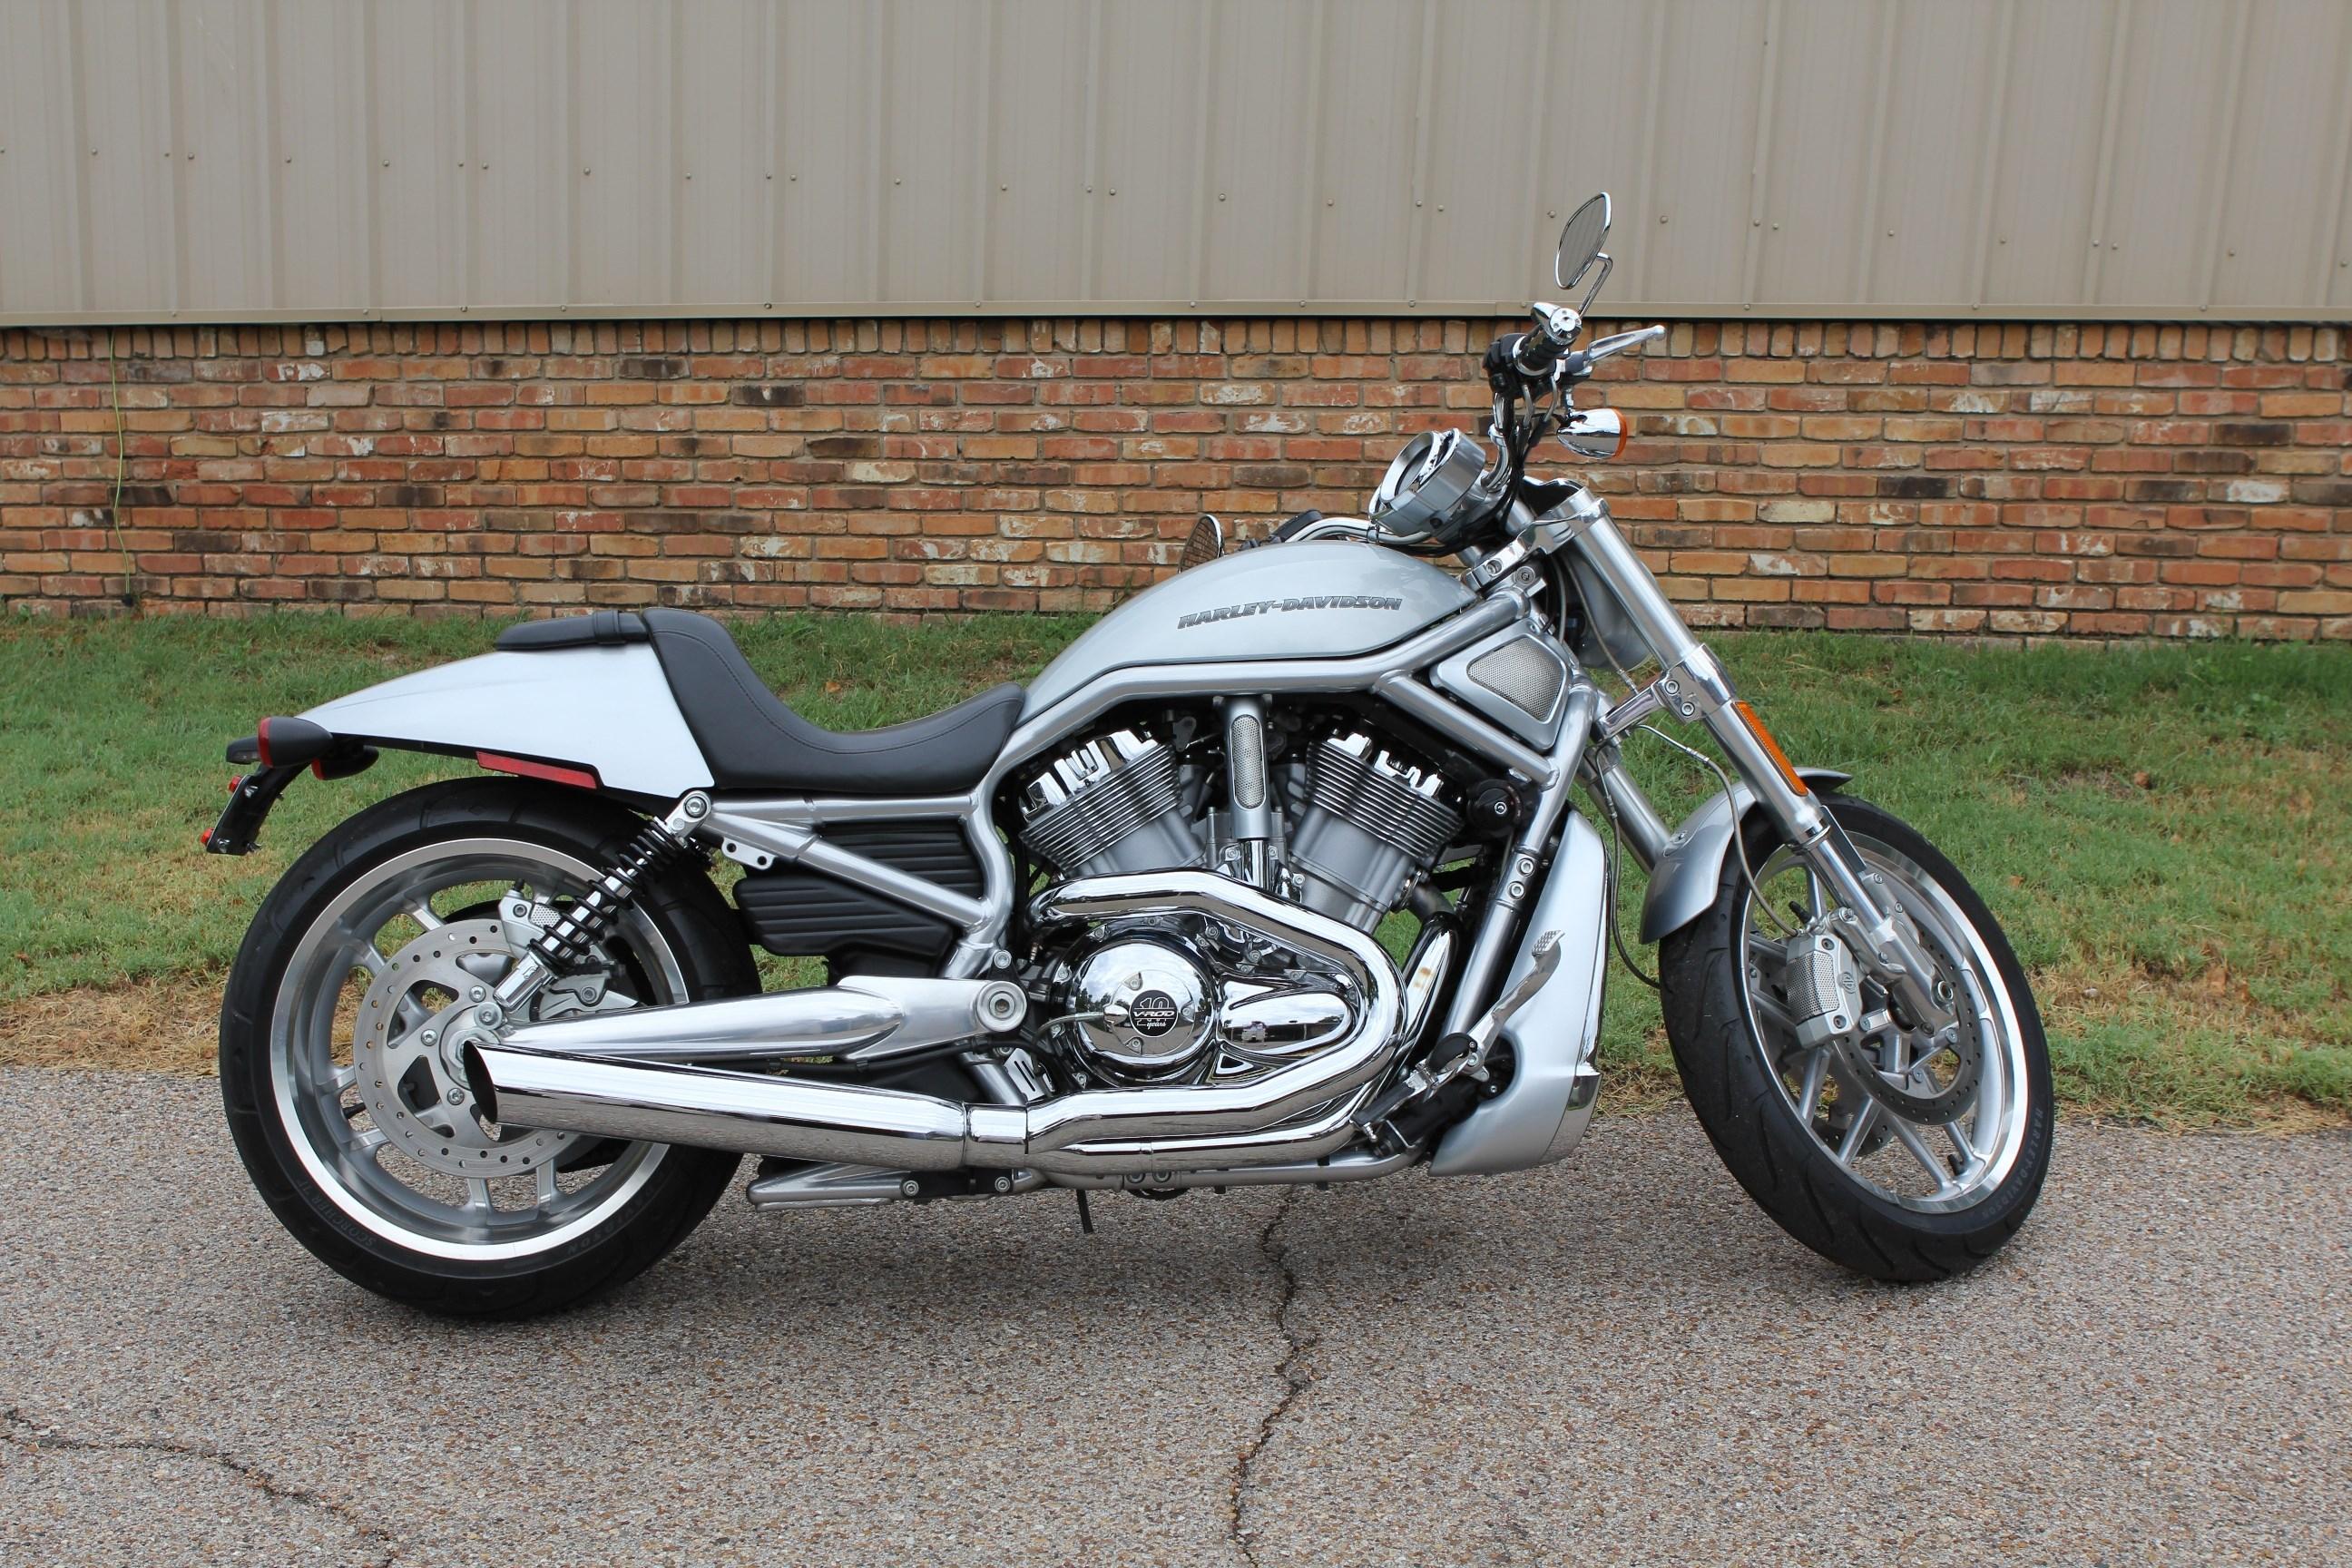 2012 Harley Davidson V Rod Night Rod Special: 2012 Harley-Davidson® VRSCDX V-Rod® Night Rod® Special